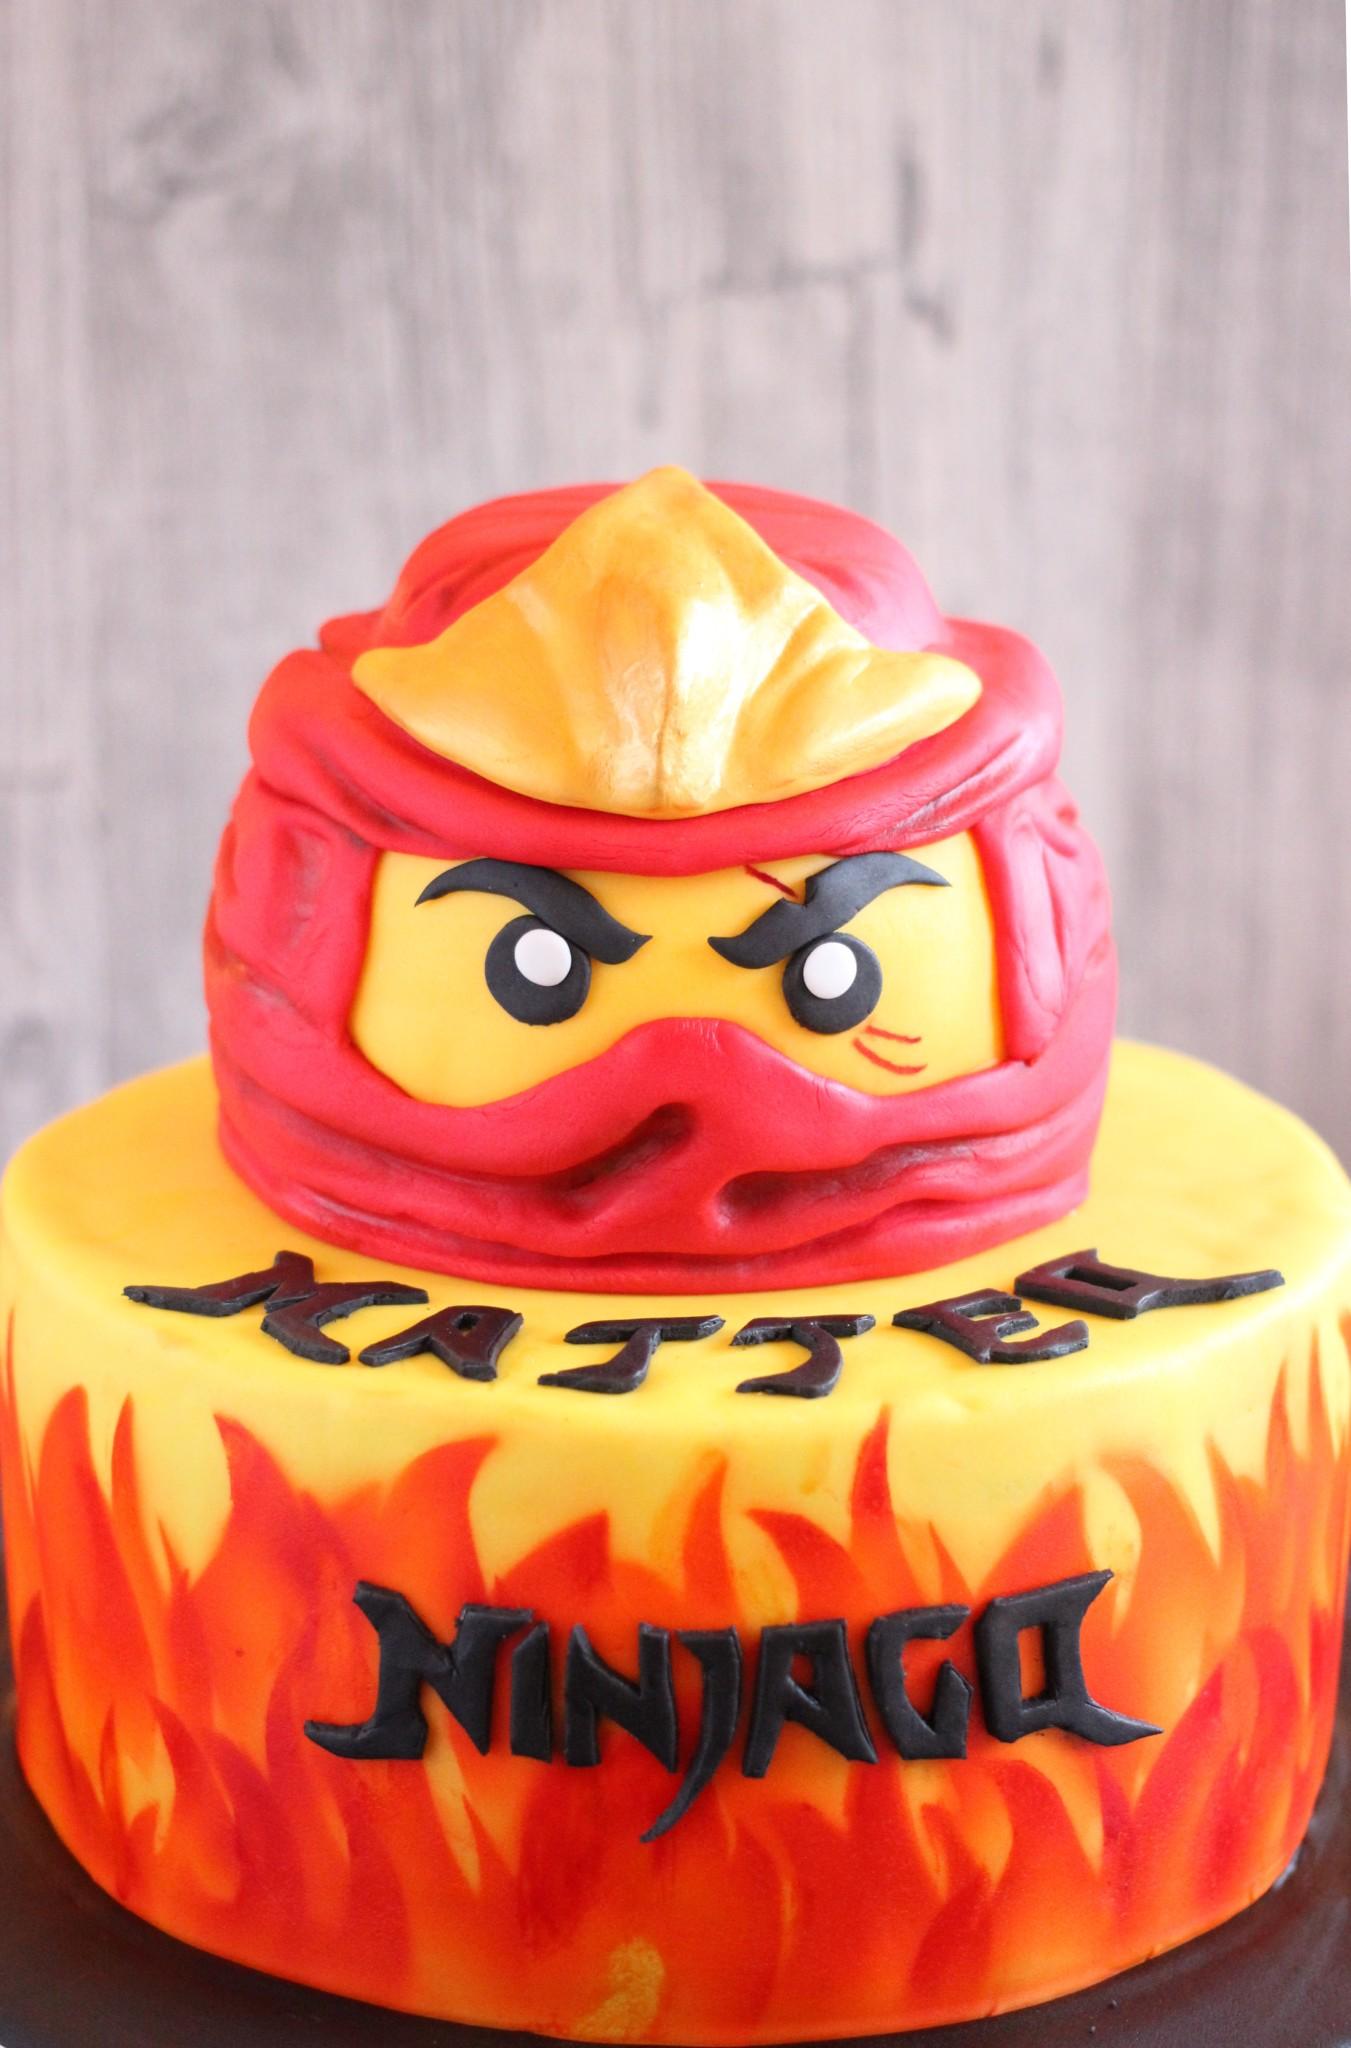 Ninjago torte sarahs cakes for Decorazioni torte ninjago